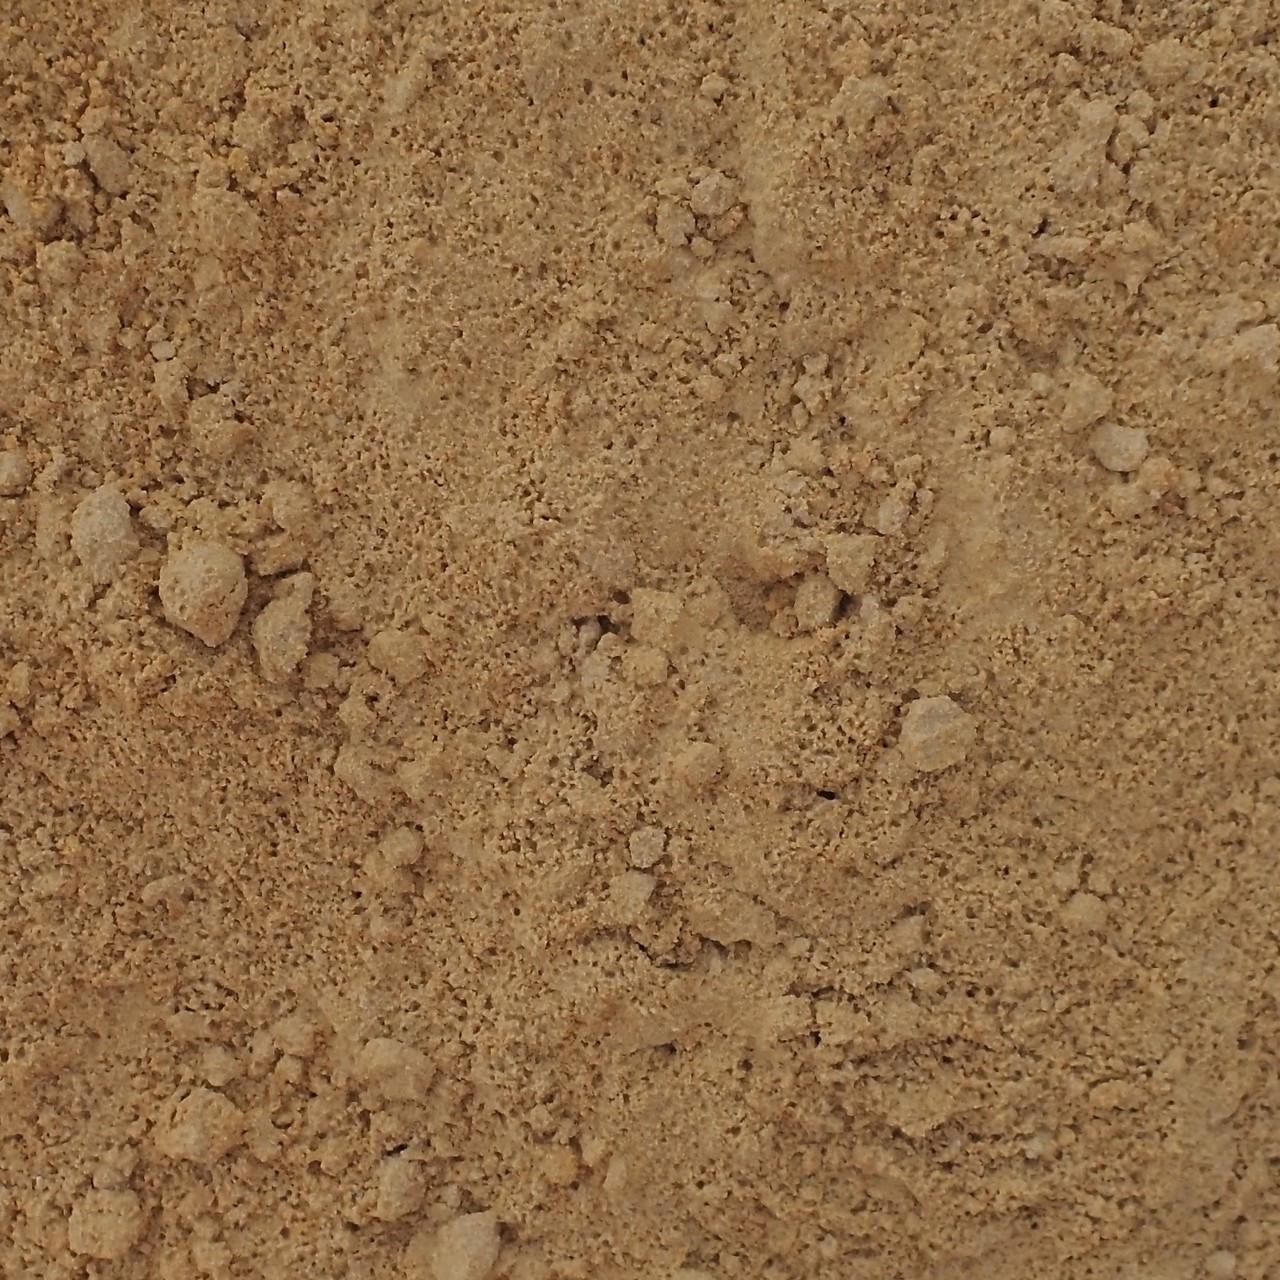 Washed Plastering Sand